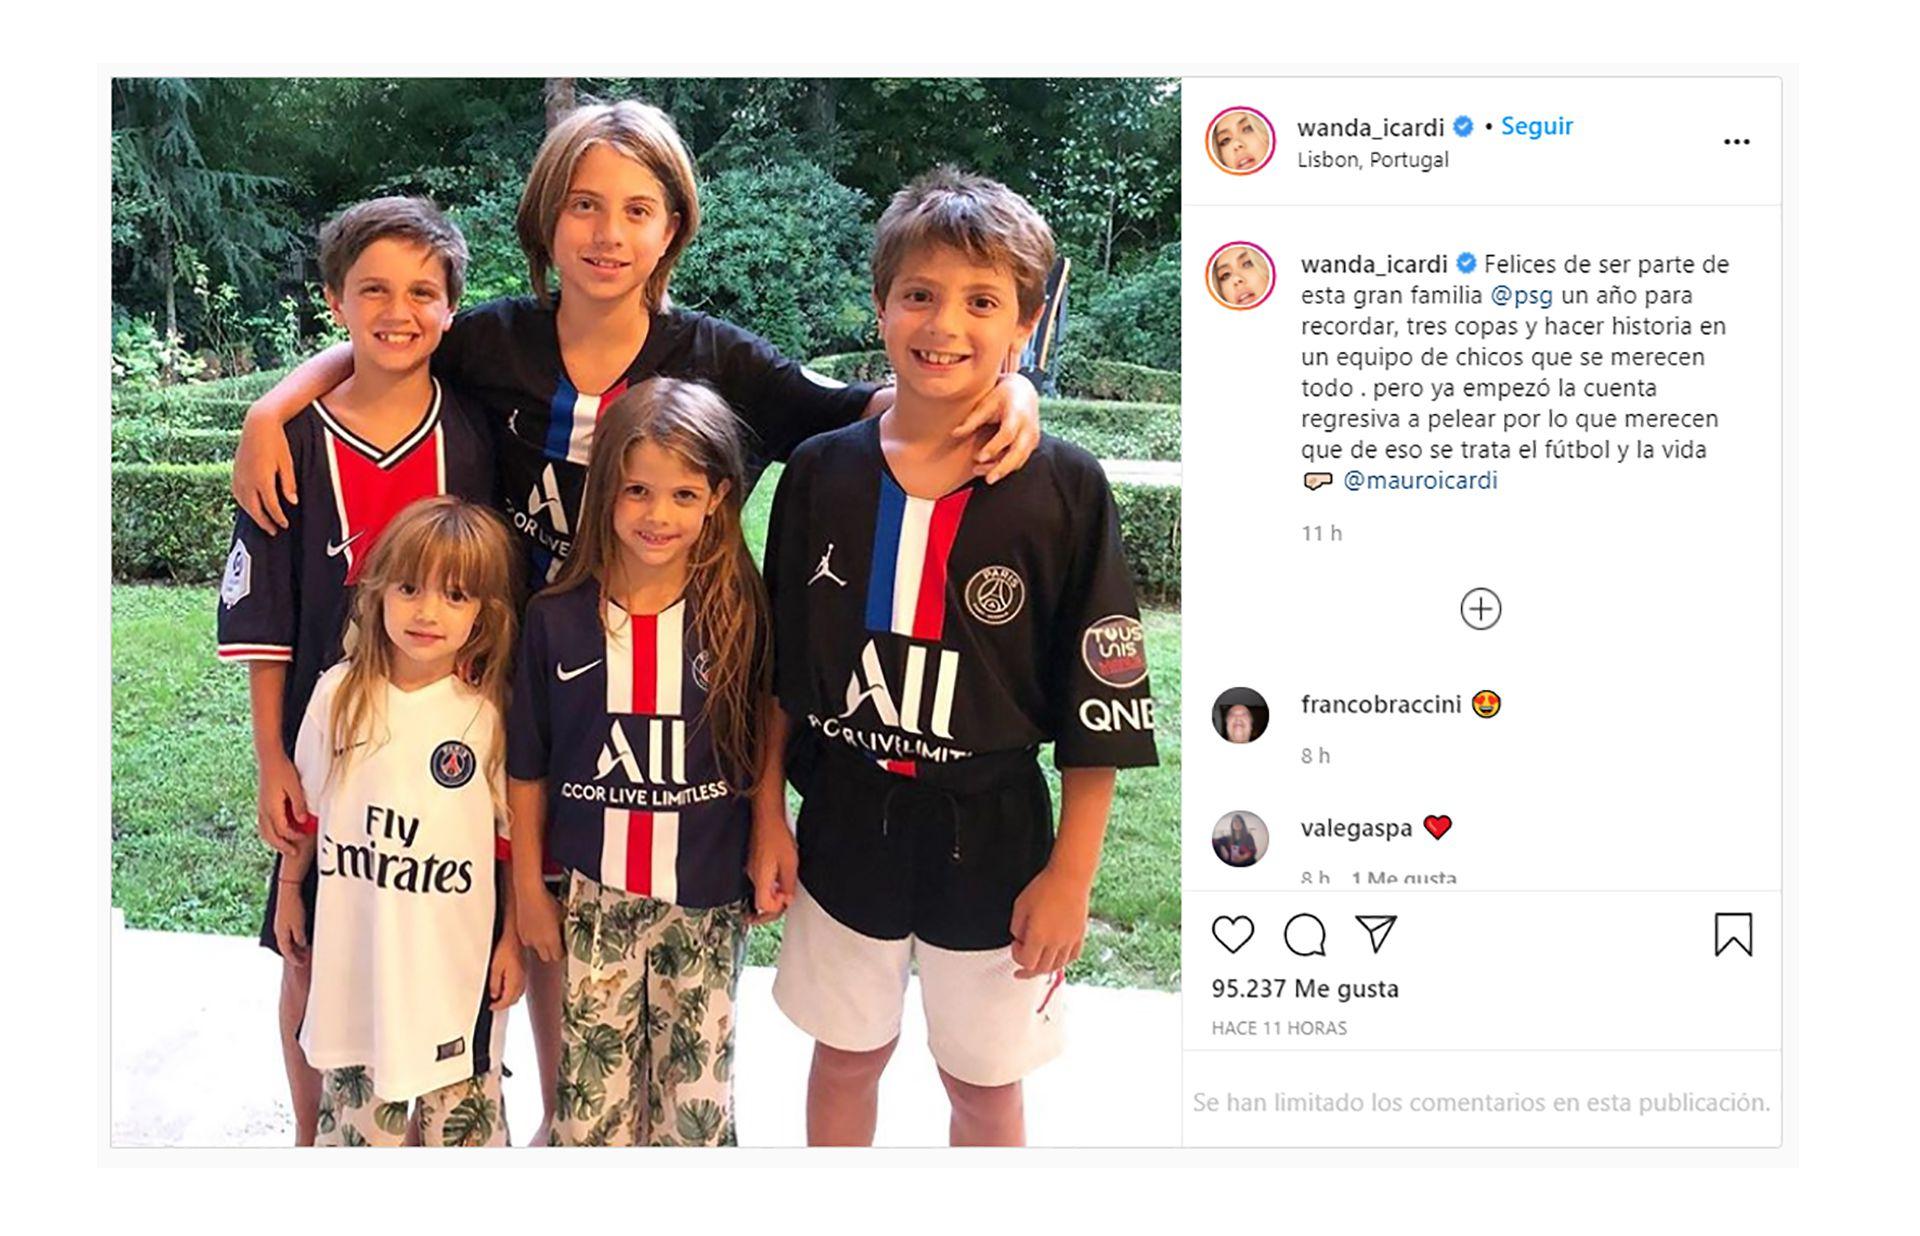 post de Wanda Nara para Mauro Icardi tras la final de Champions League